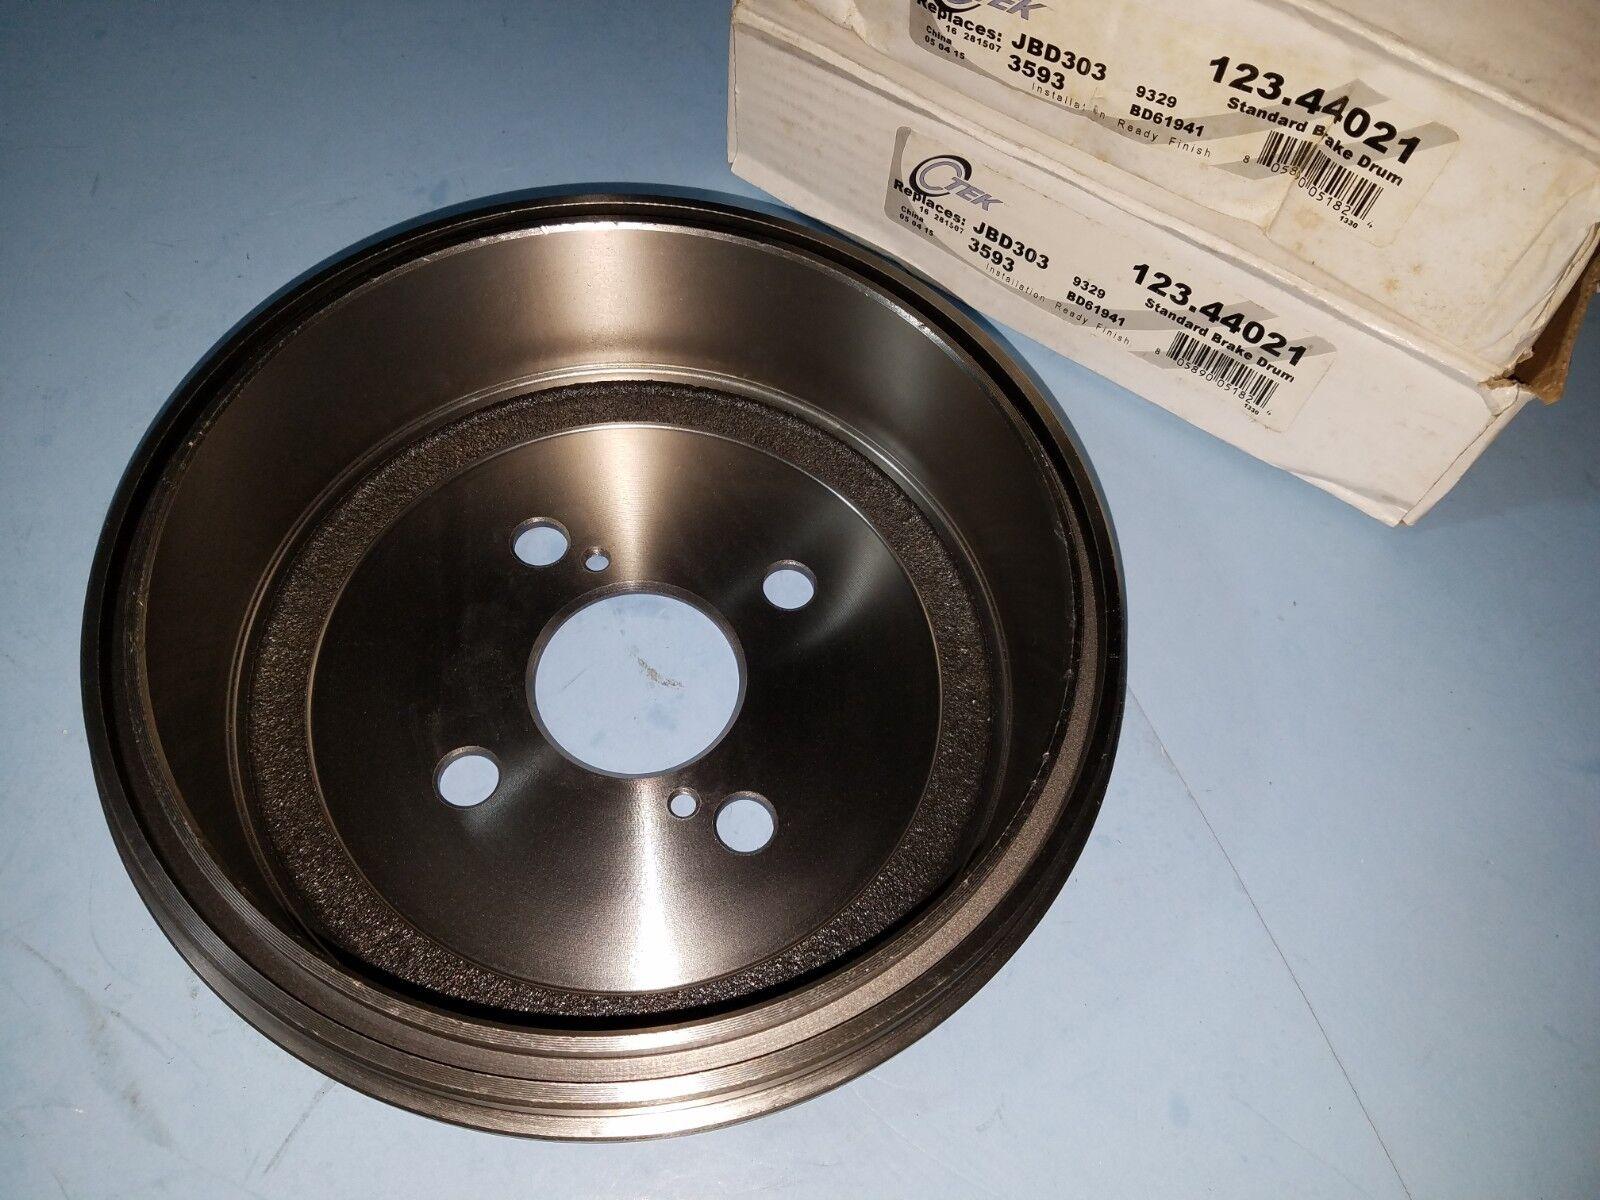 Centric Parts 123.44021 C-Tek Standard Brake Drum